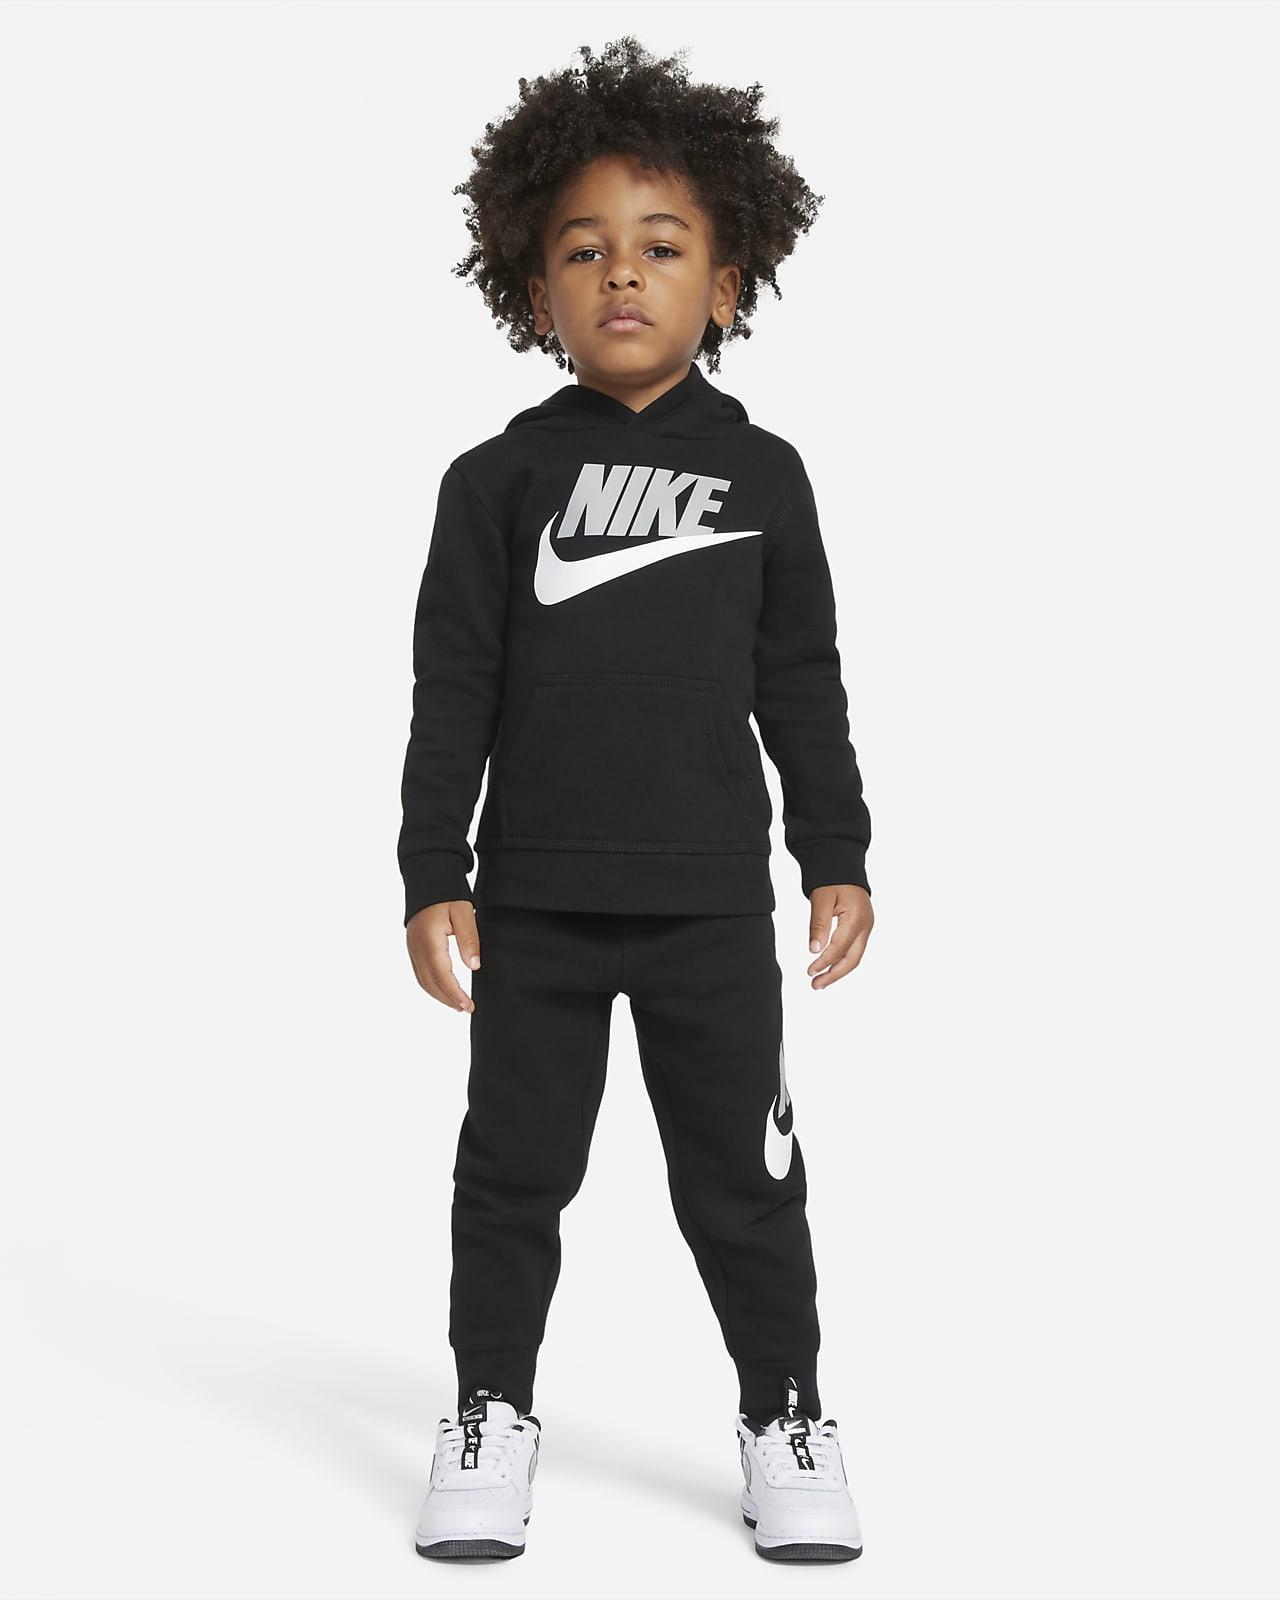 Nike Sportswear Club Fleece Toddler Hoodie and Trousers Set